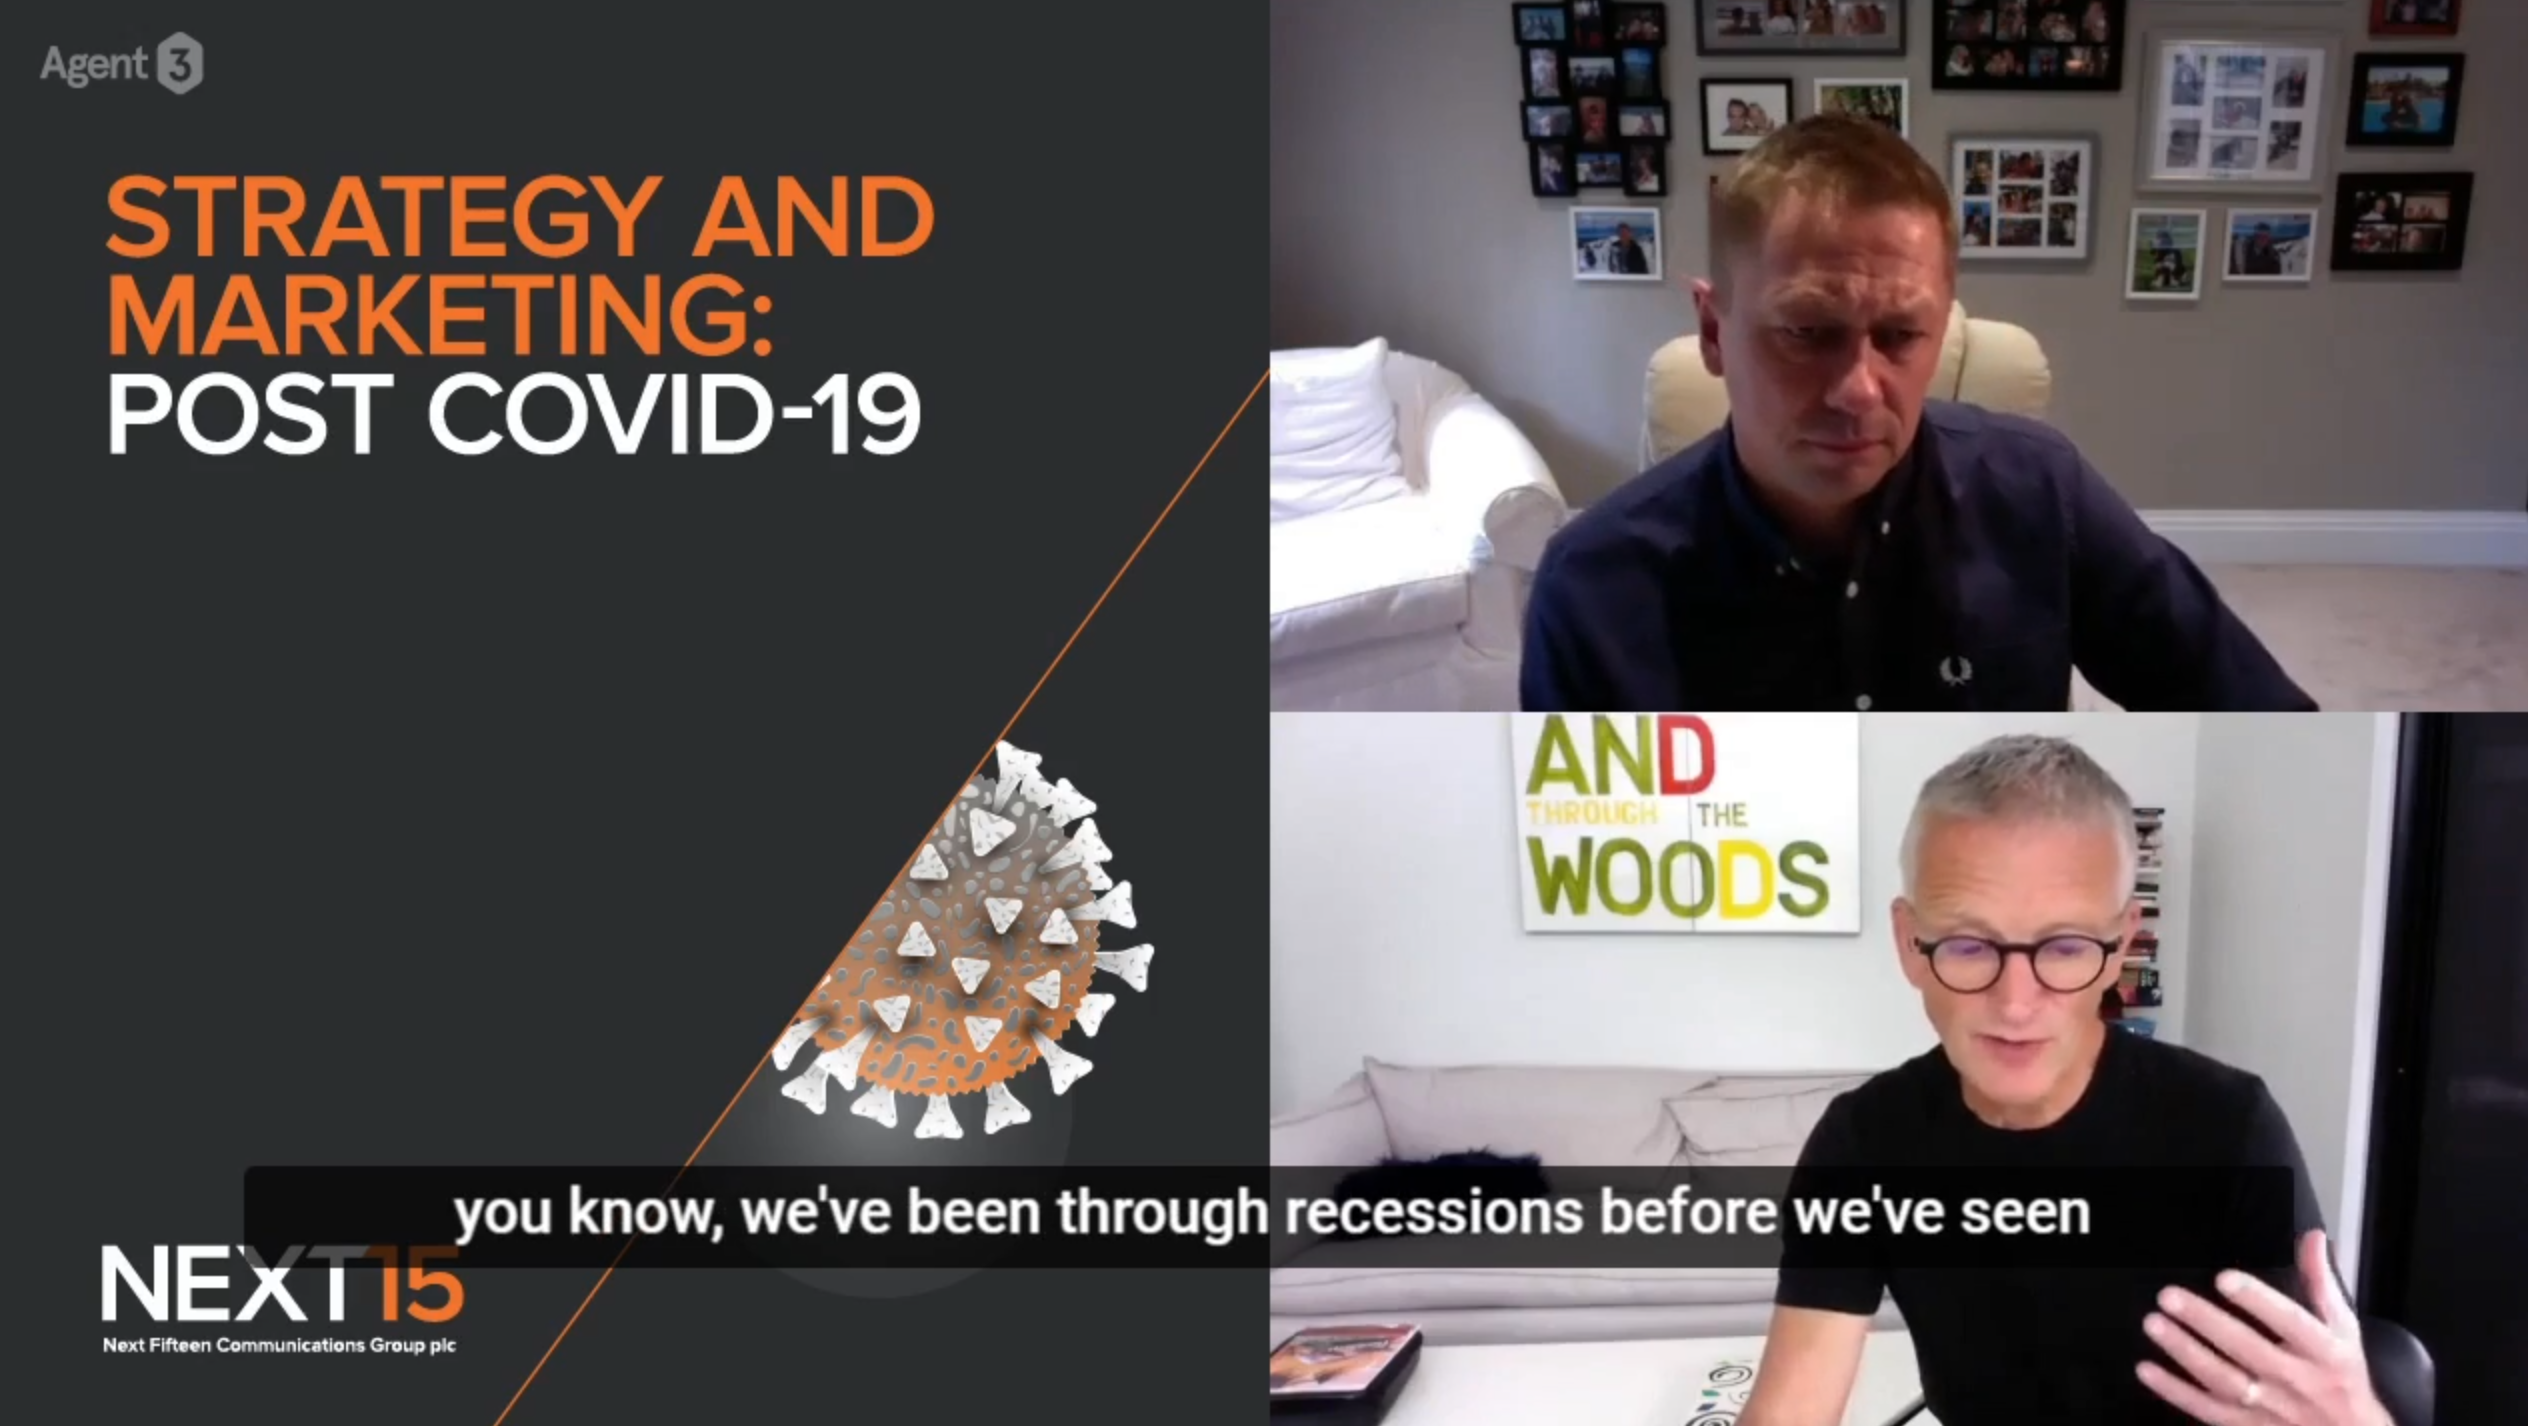 [Video & Report] Marketing strategy: post COVID-19